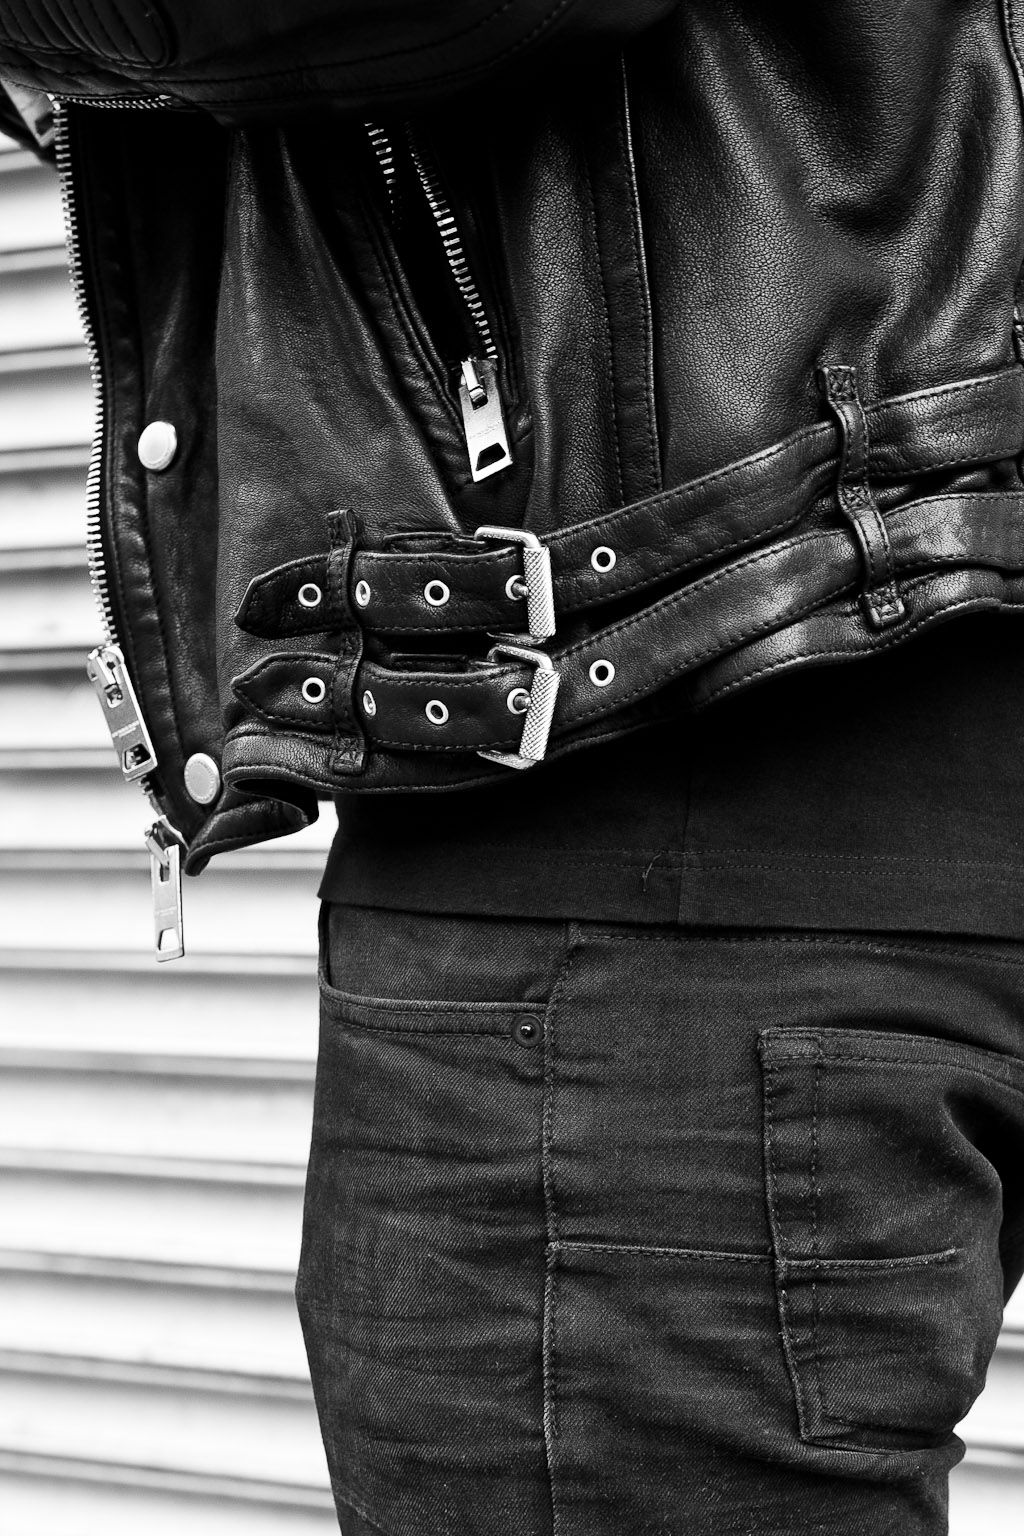 Leather jacket aesthetic - Burberry Brit Biker Biker Jacketsleather